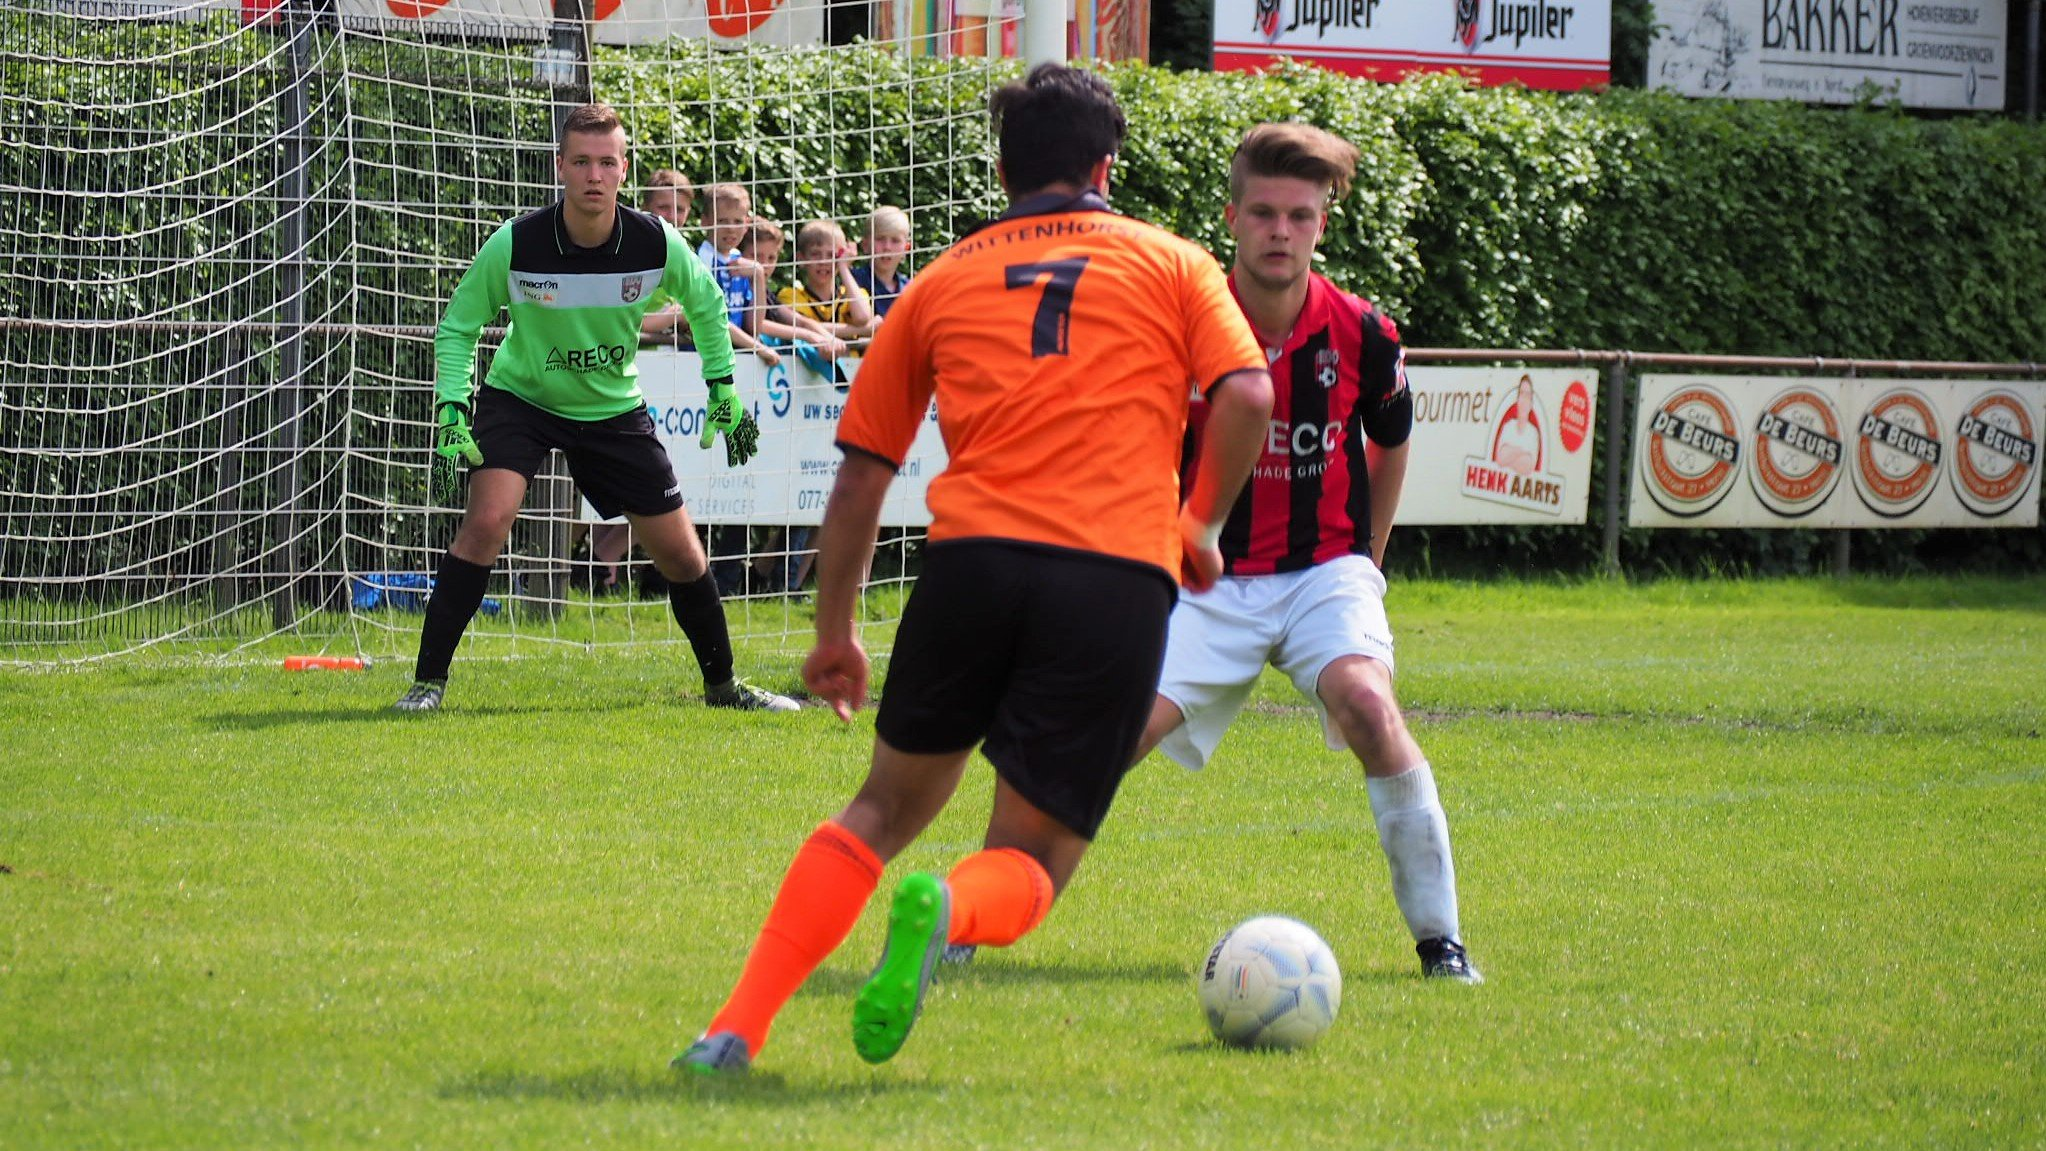 Wittenhorst - EDO - Voetbal in Haarlem